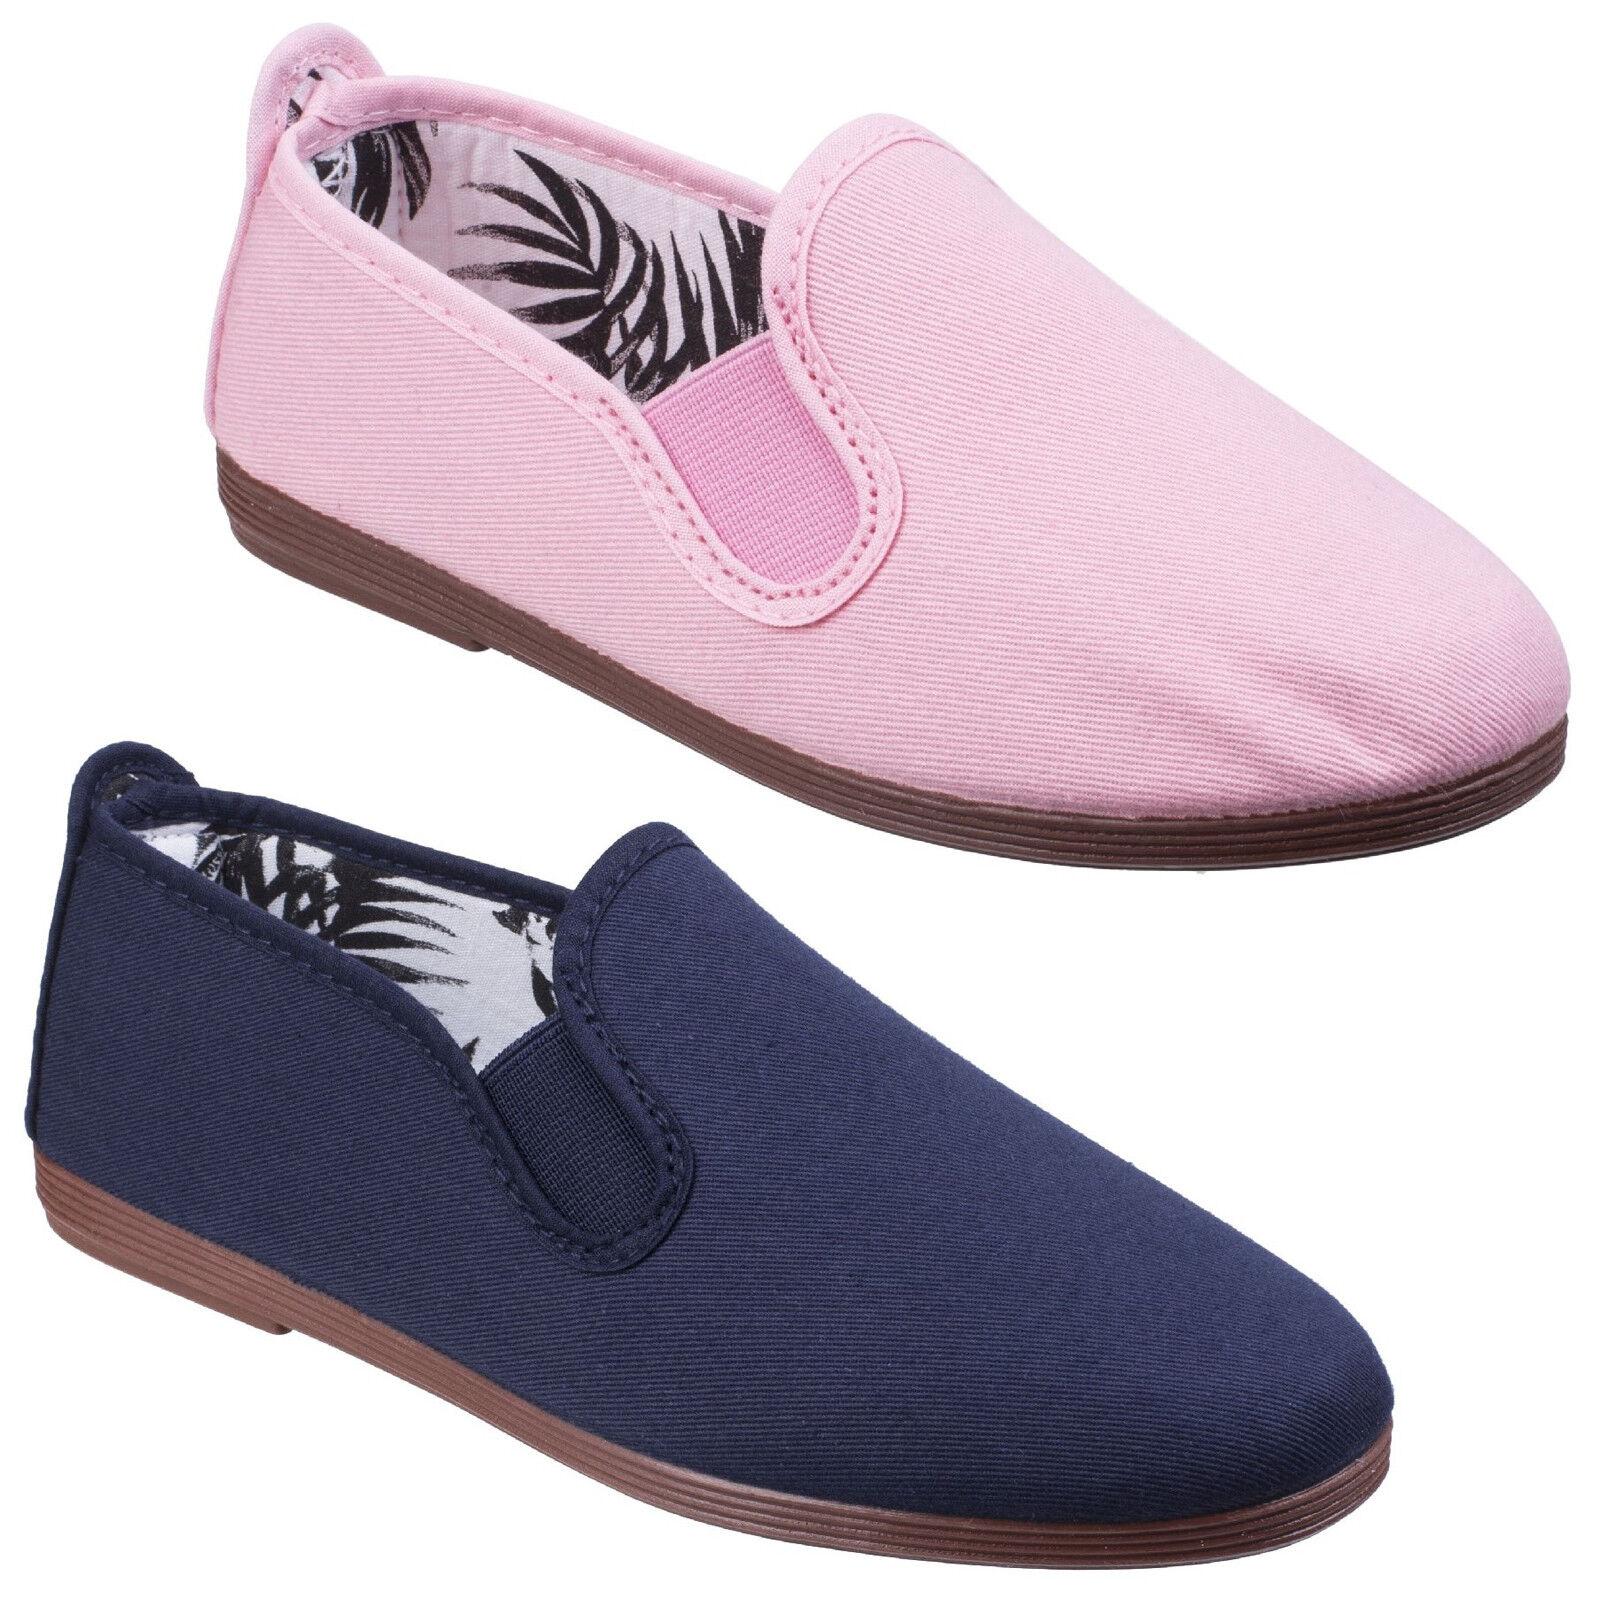 Javer Kung-FU Chaussures en toile pour femme